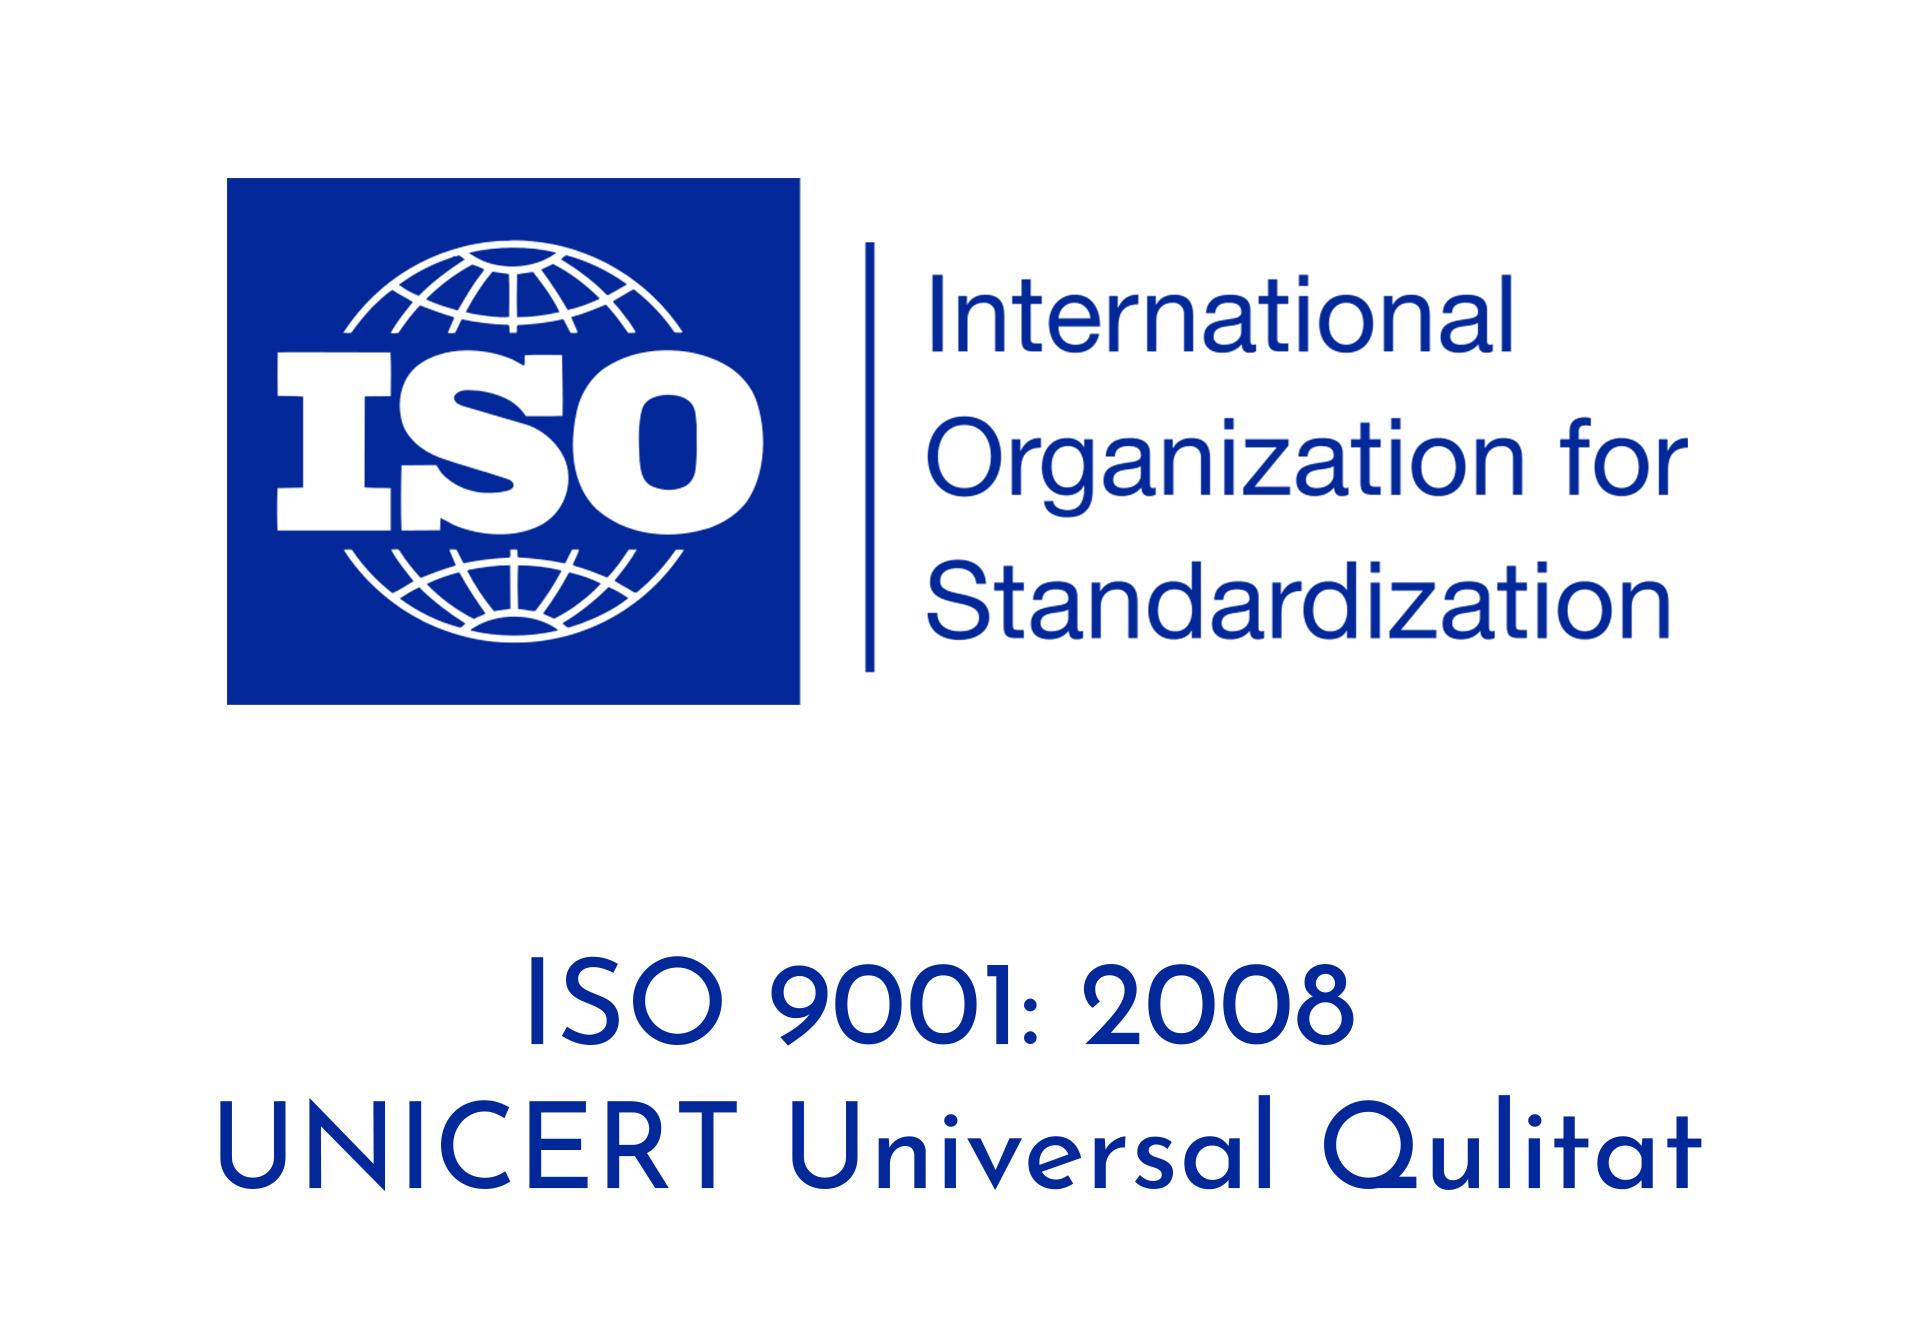 ISO 9001 2008 UNICERT Universal Qulitat